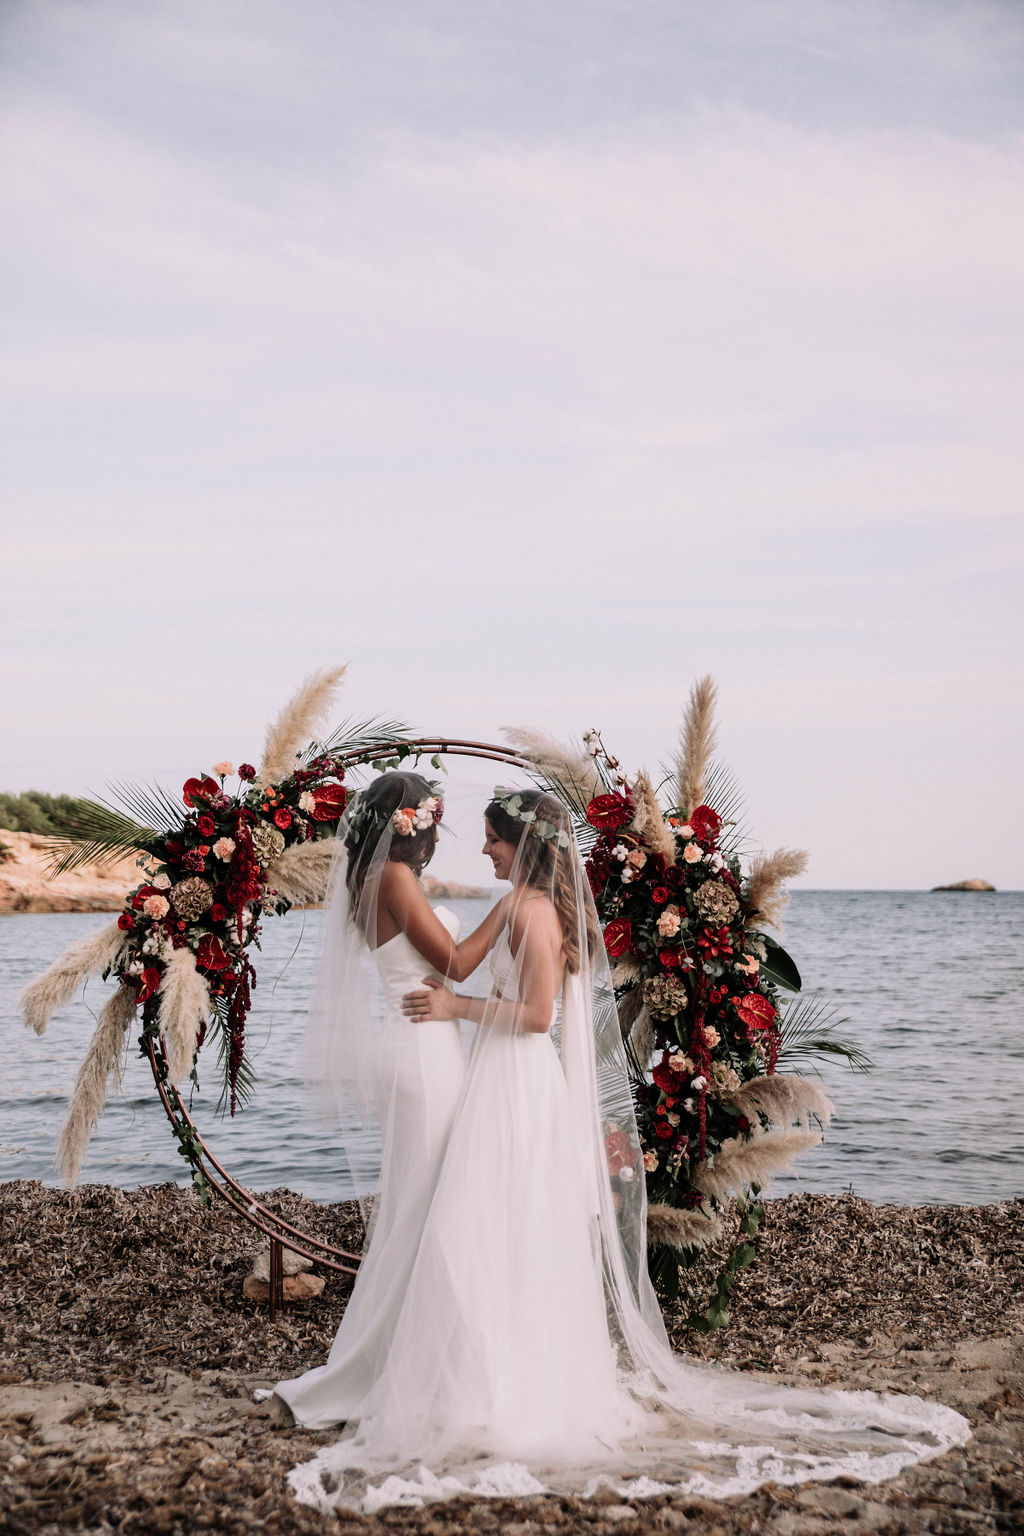 Two brides one veil, gay wedding inspiration